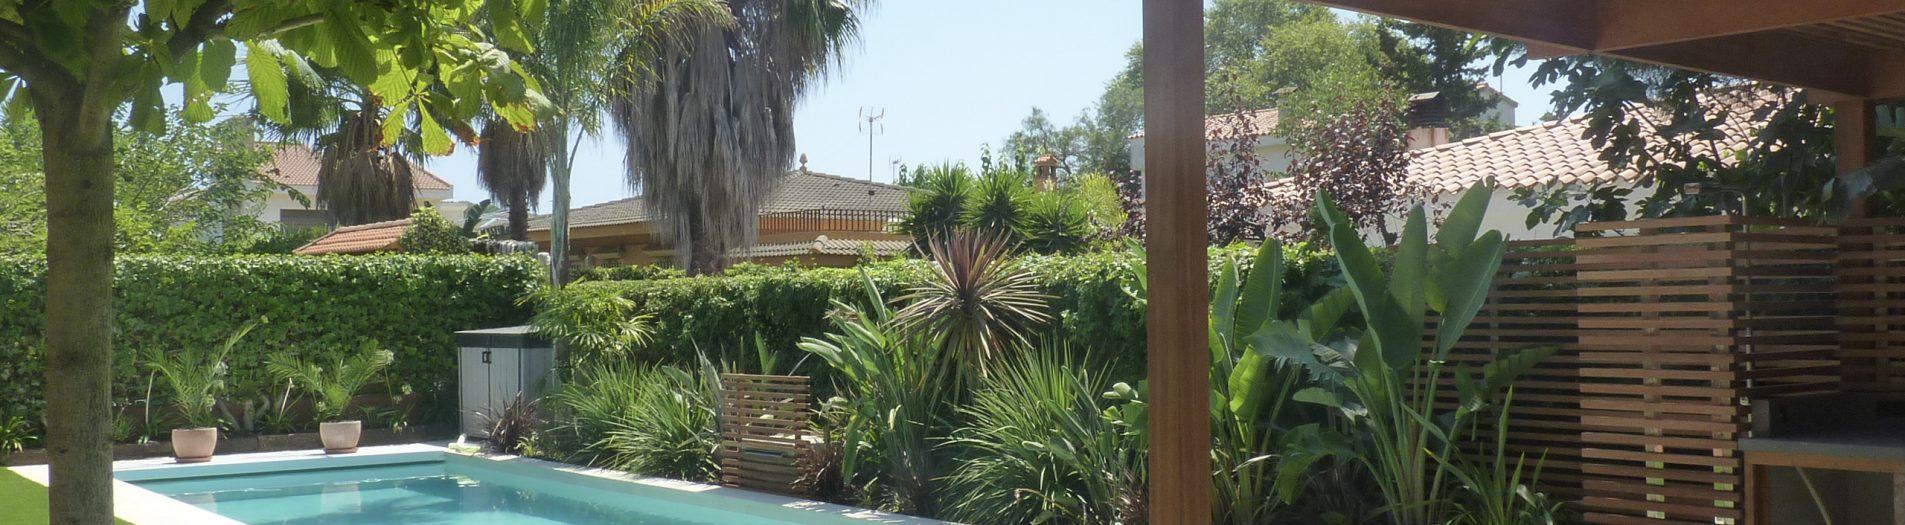 Garden & Pool at Tarragona